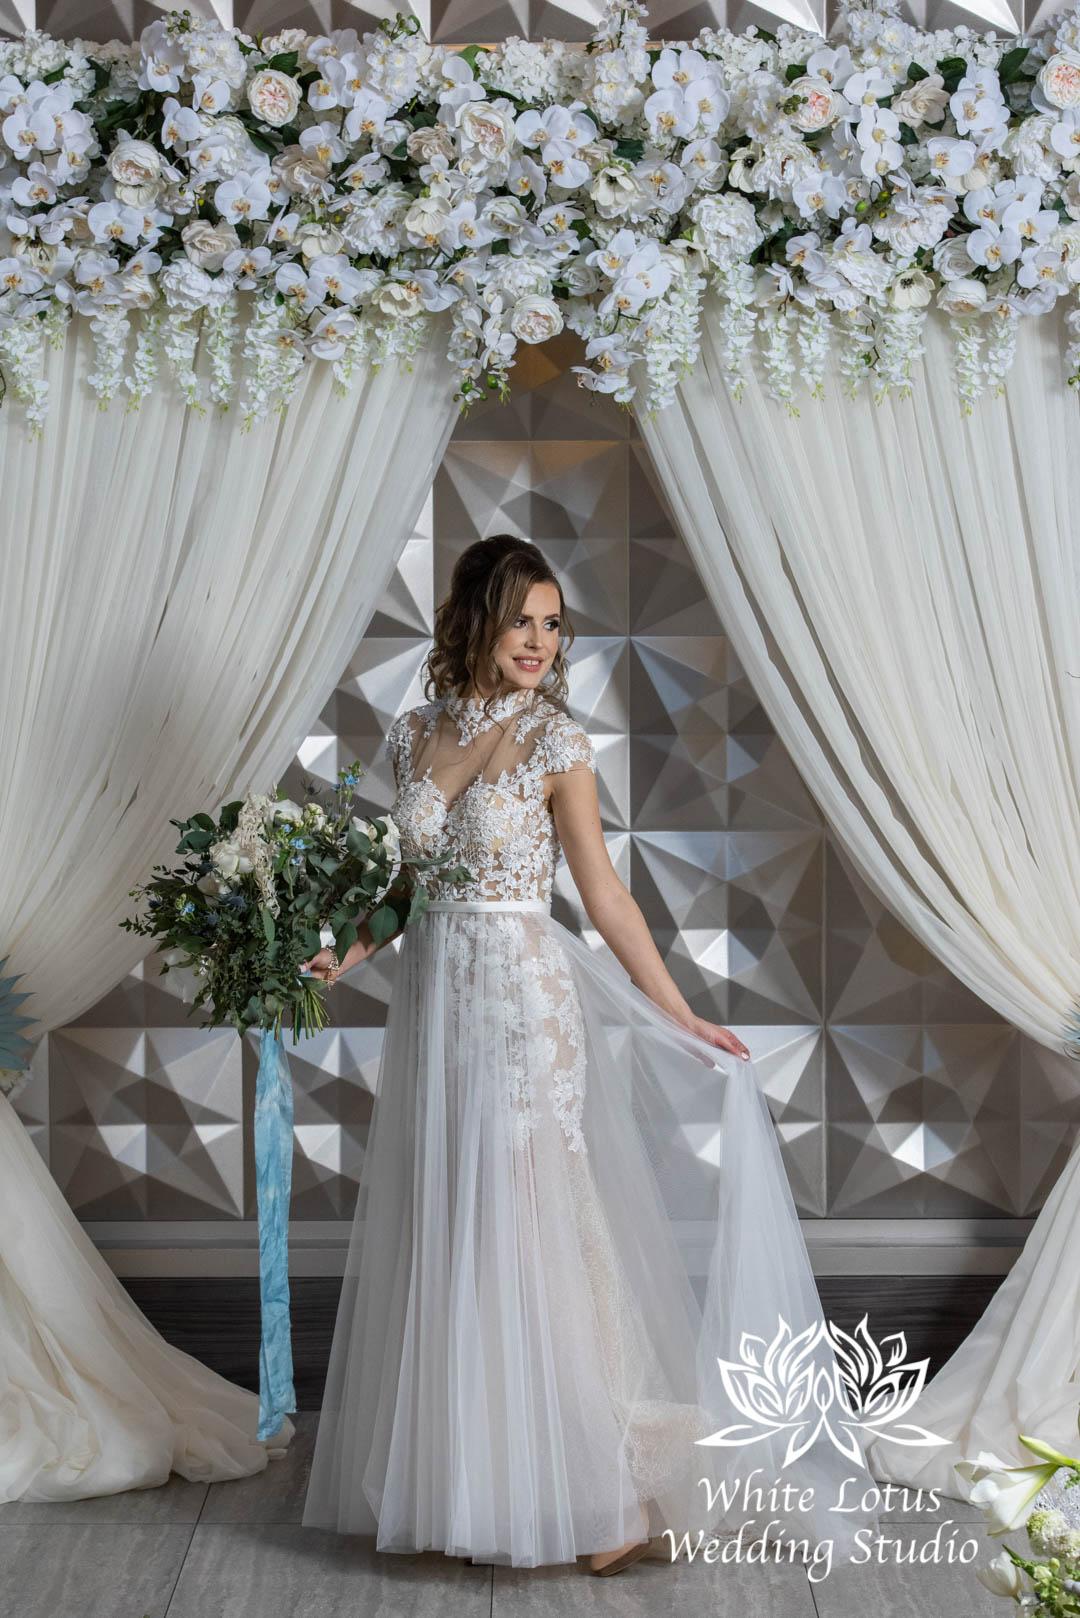 056- GLAM WINTERLUXE WEDDING INSPIRATION